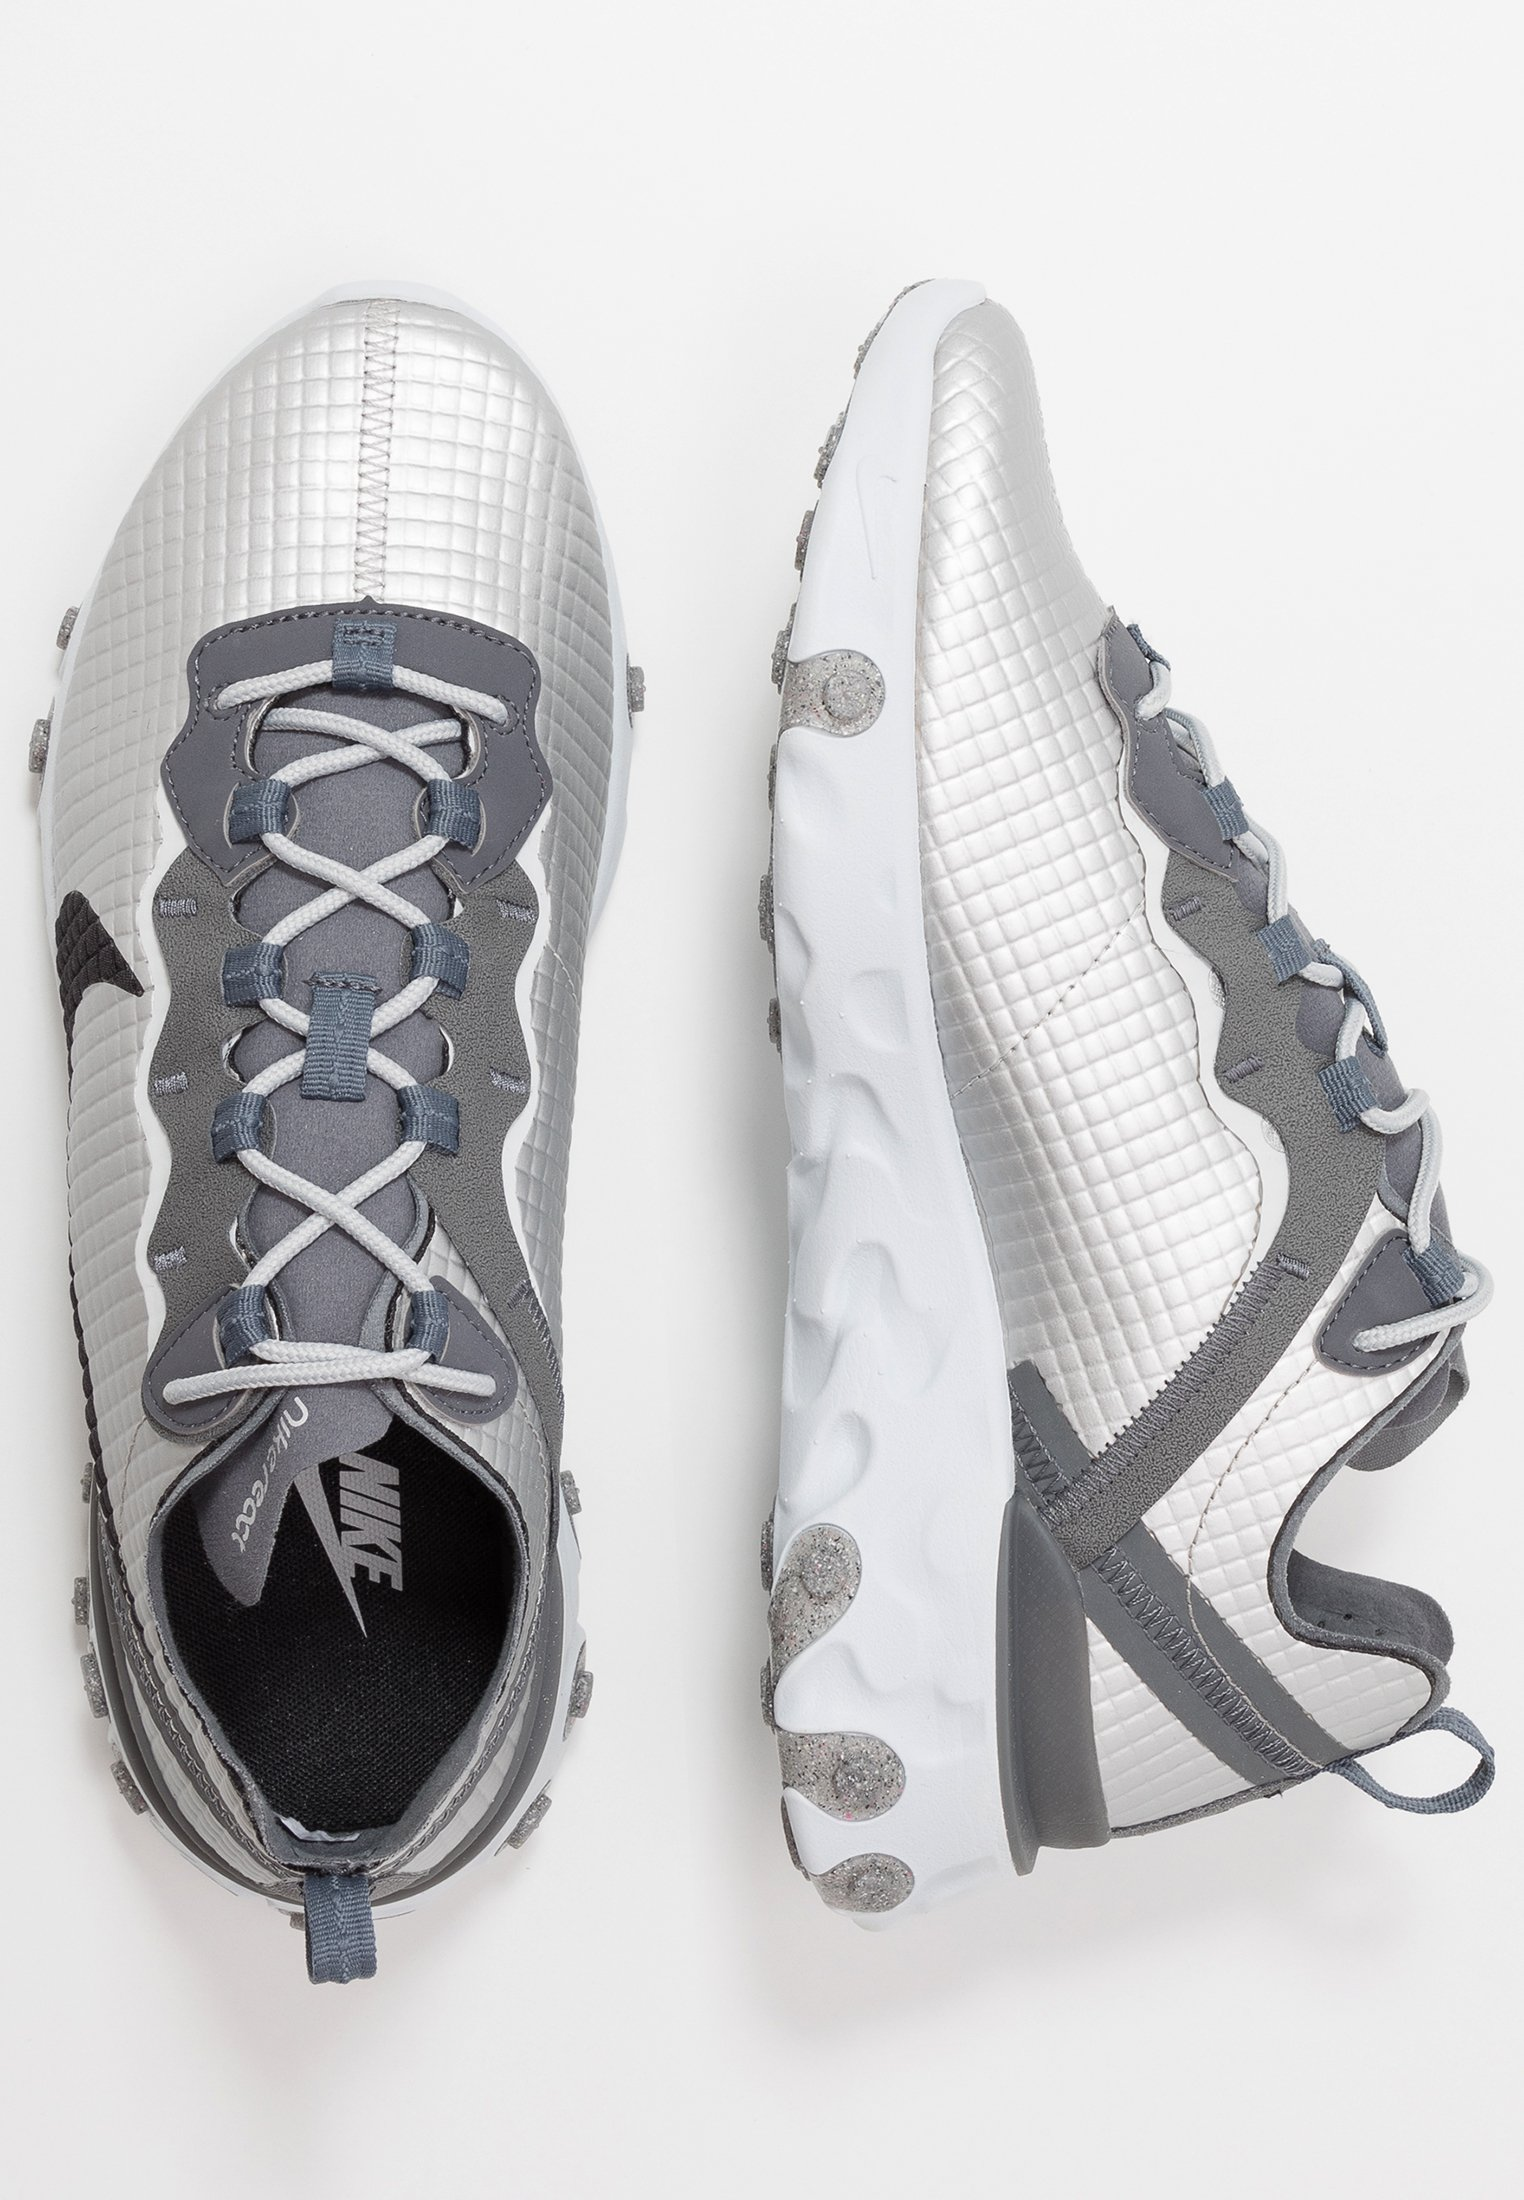 REACT ELEMENT 55 Sneakers laag metallic silverblackpure platinumdark grey